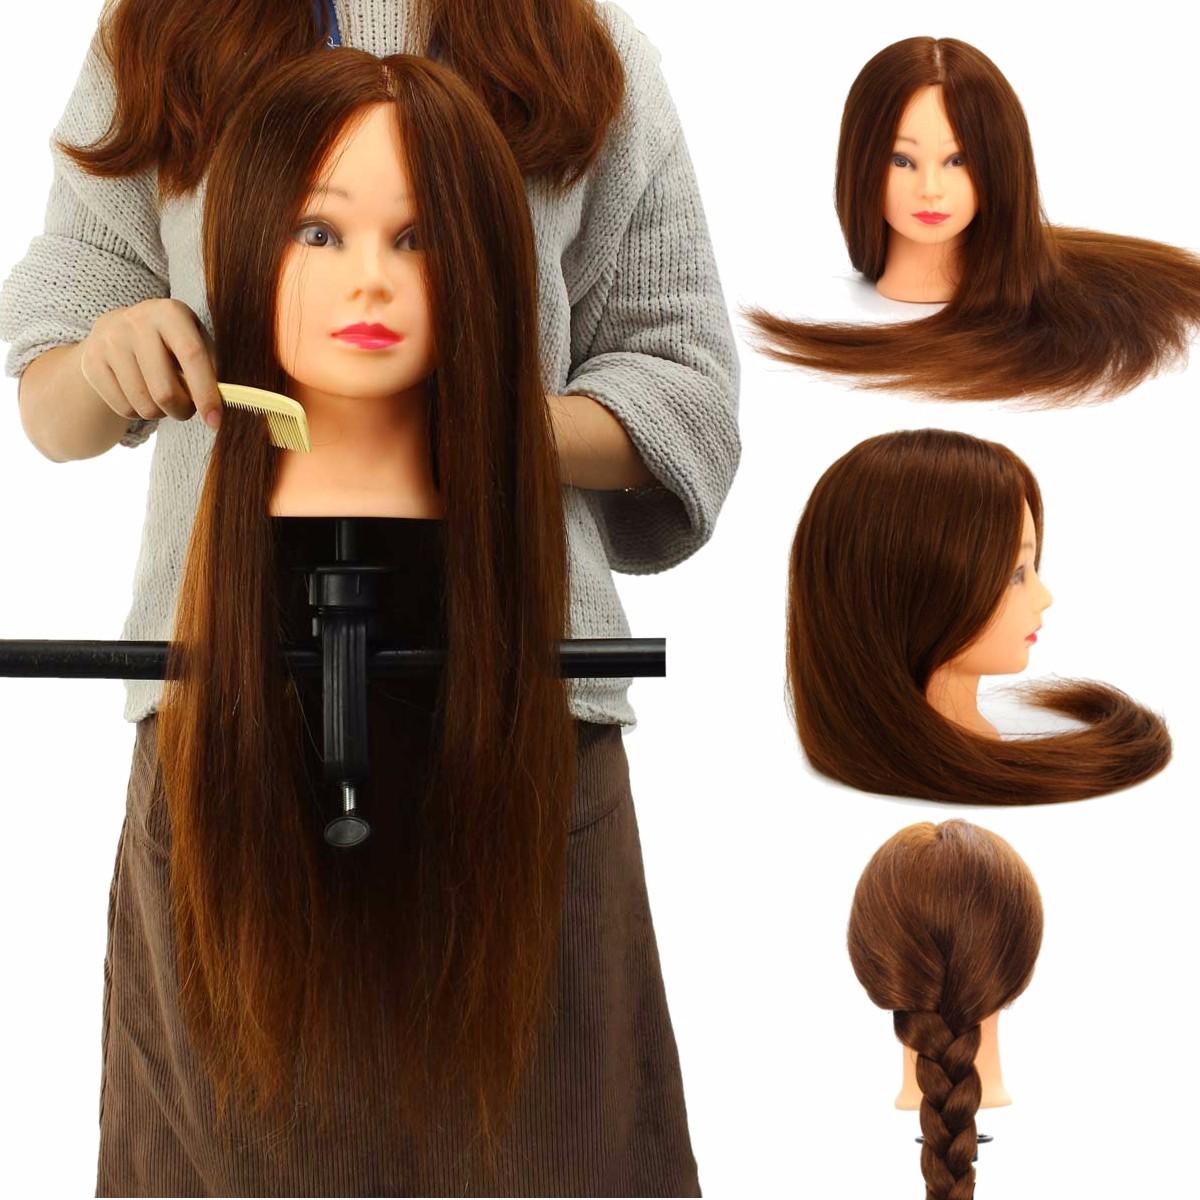 100% Real Human Hair Mannequin Head Salon Hairdressing ...